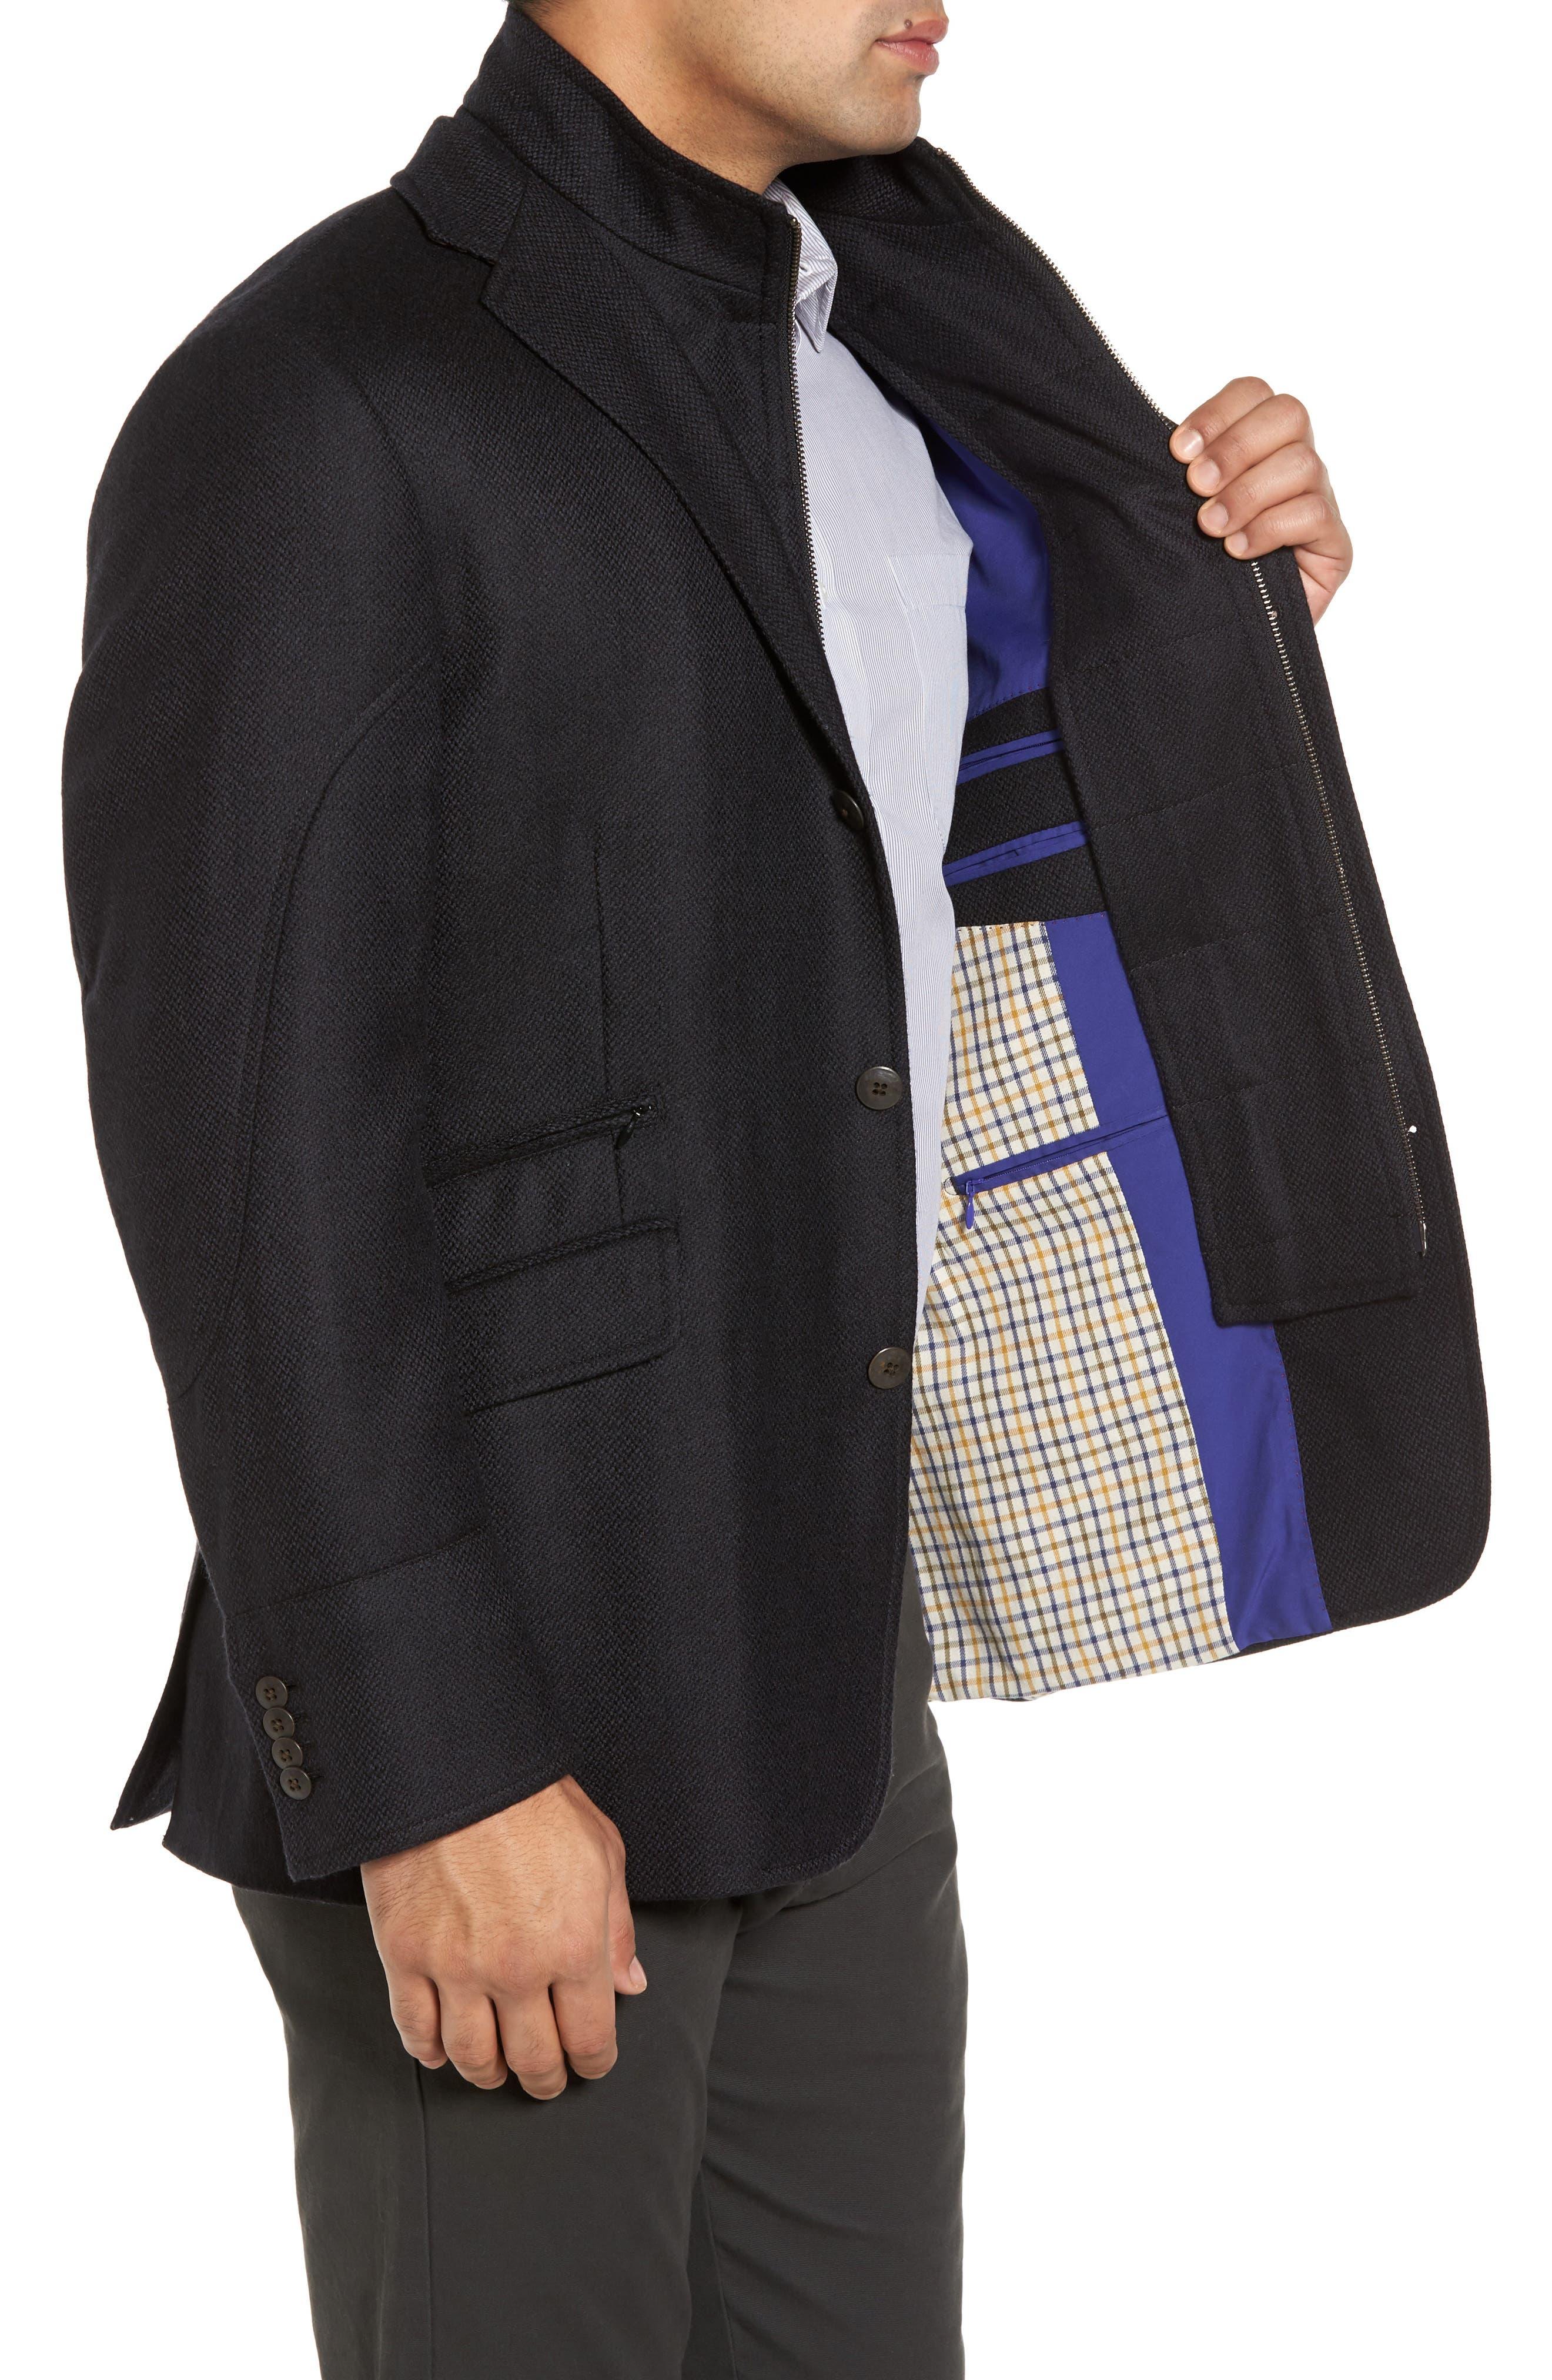 Alternate Image 3  - Kroon Ritchie Aim Hybrid Classic Fit Wool & Cashmere Sport Coat